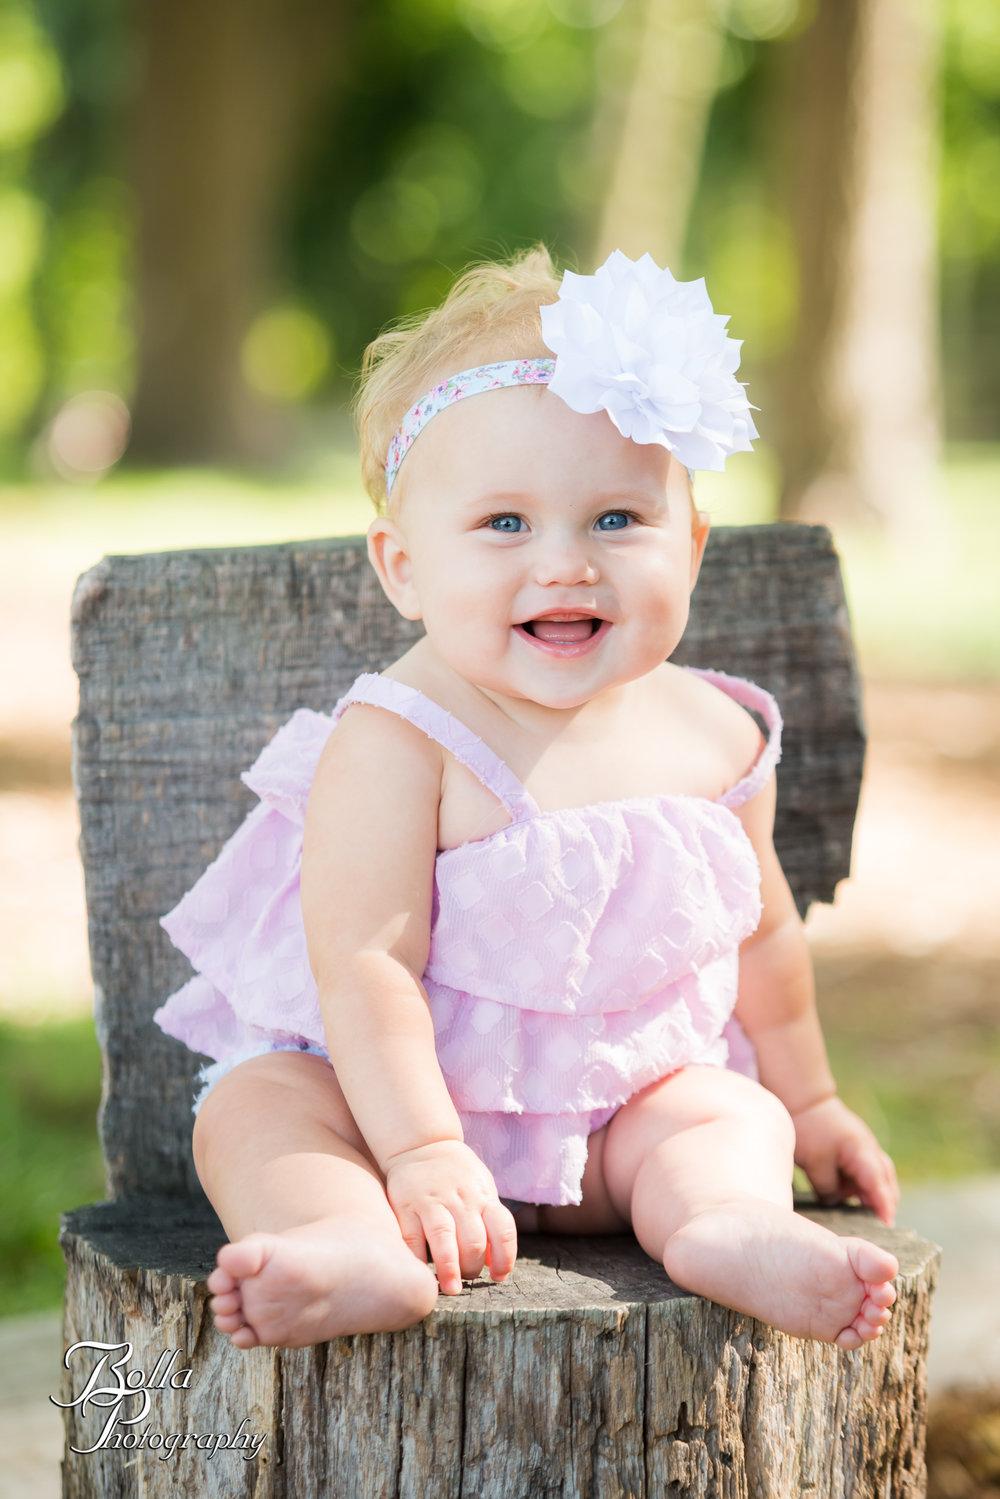 20170805_Bolla photography edwardsville wedding newborn photographer st louis weddings babies-0002.jpg